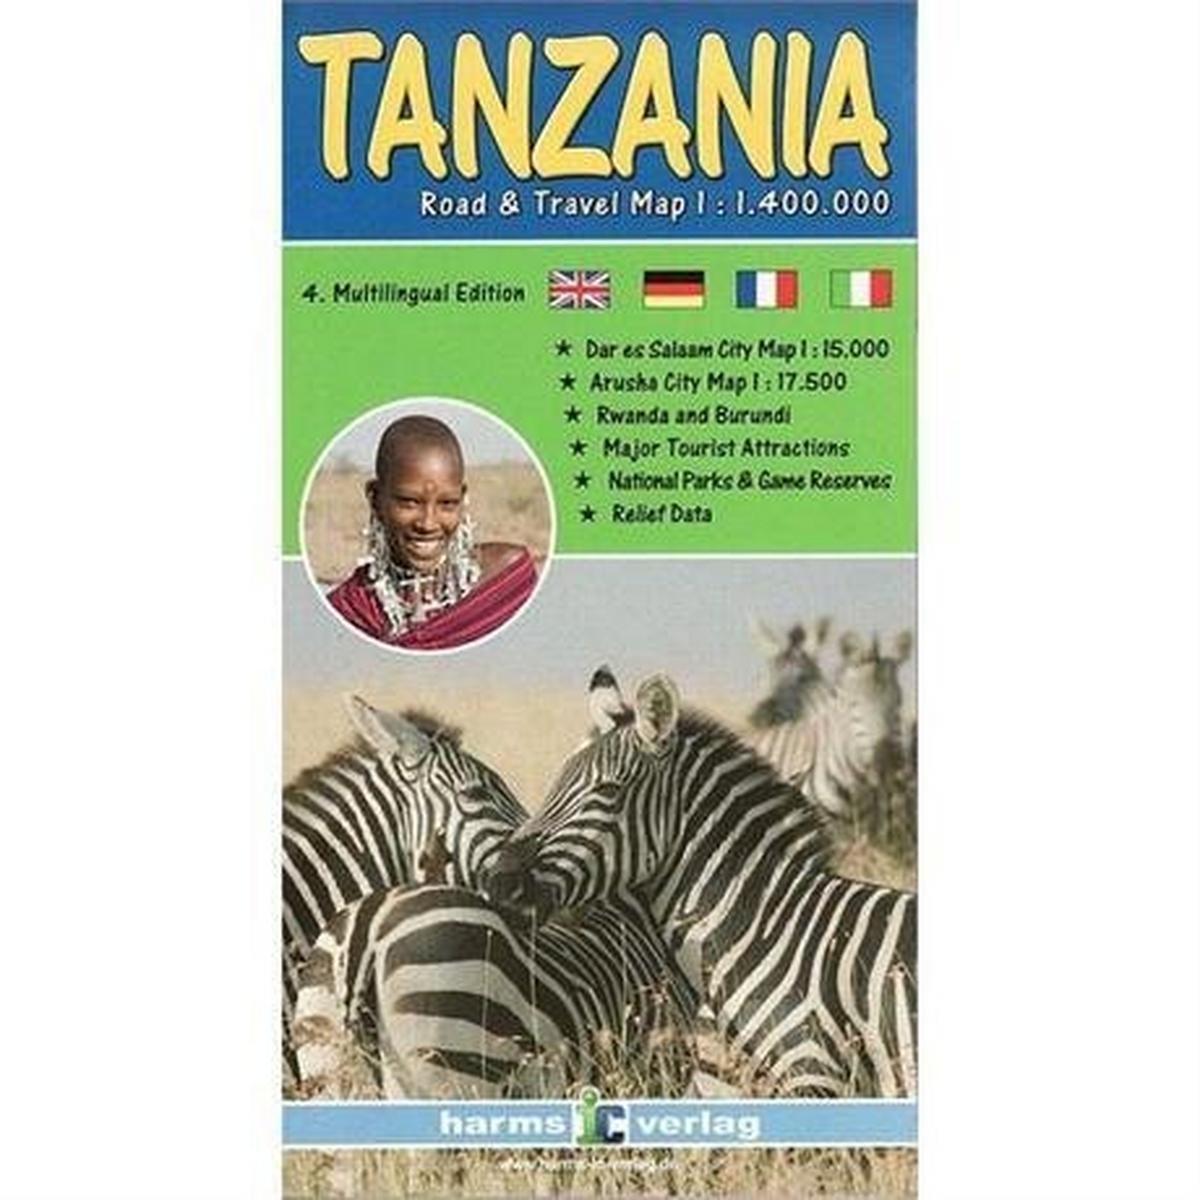 Miscellaneous Map: Tanzania 1:1,400,000